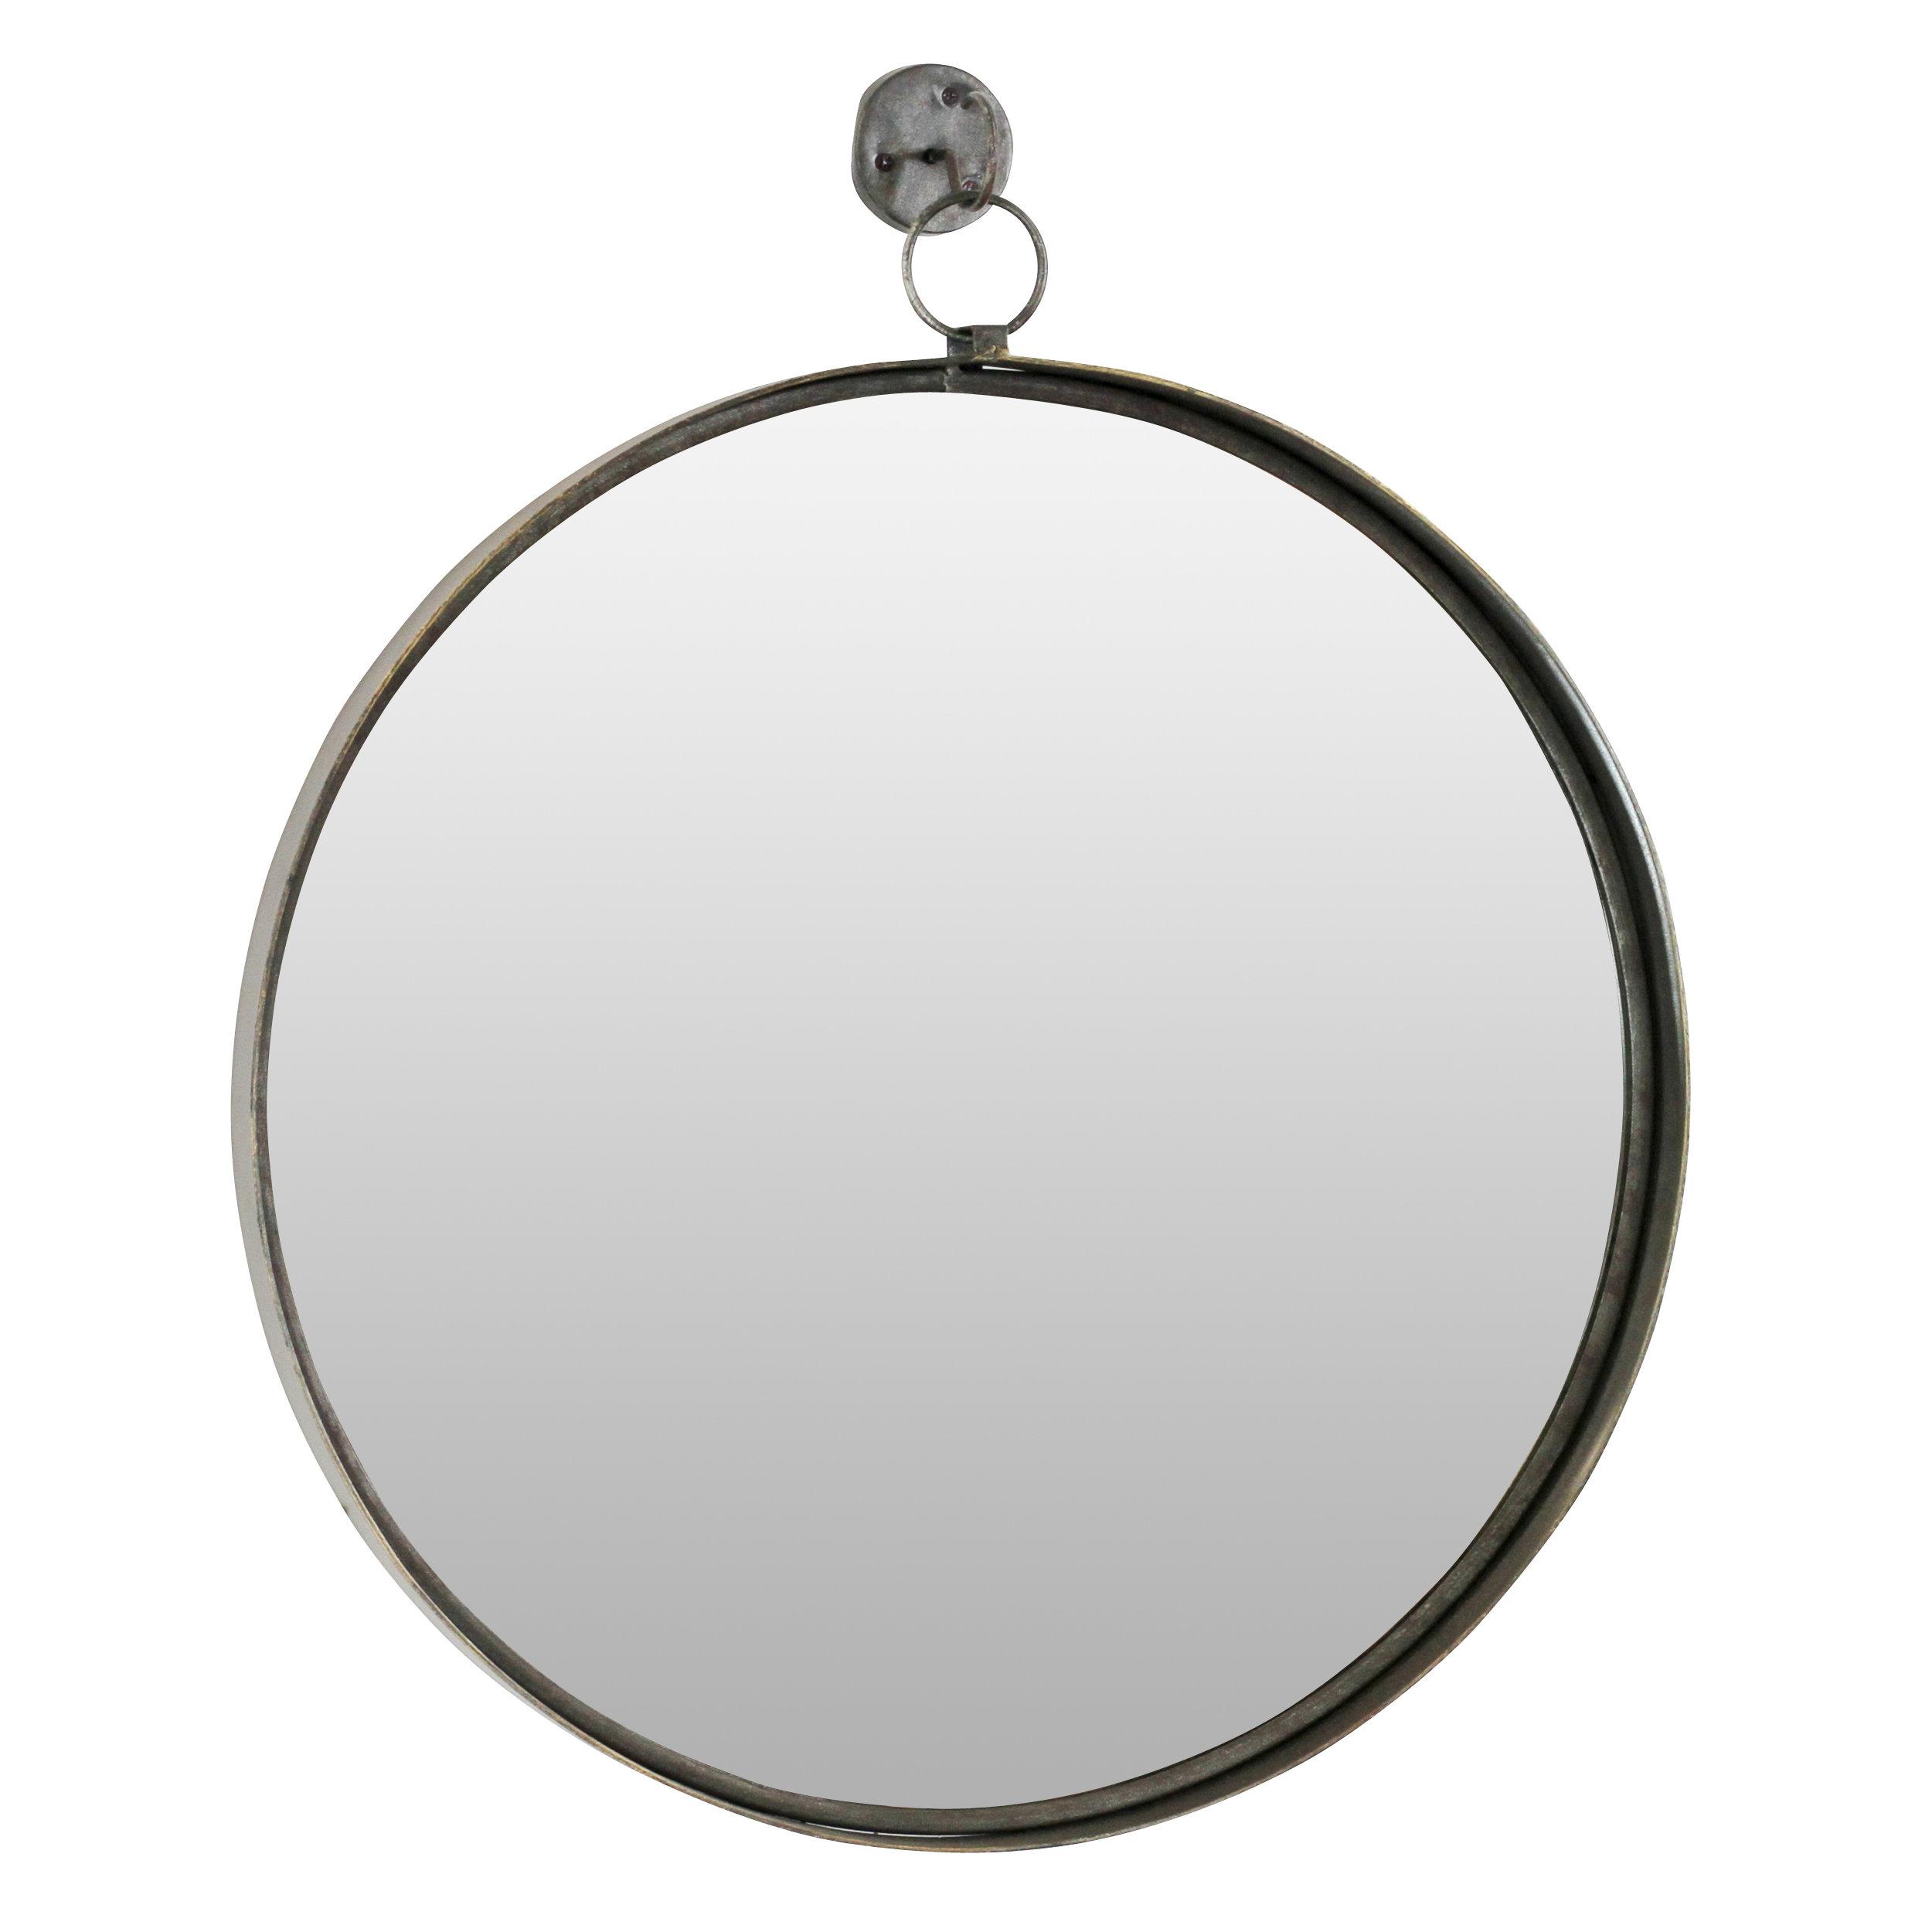 Metal Wall Mirrors You'll Love In 2019 | Wayfair Throughout Koeller Industrial Metal Wall Mirrors (View 11 of 20)